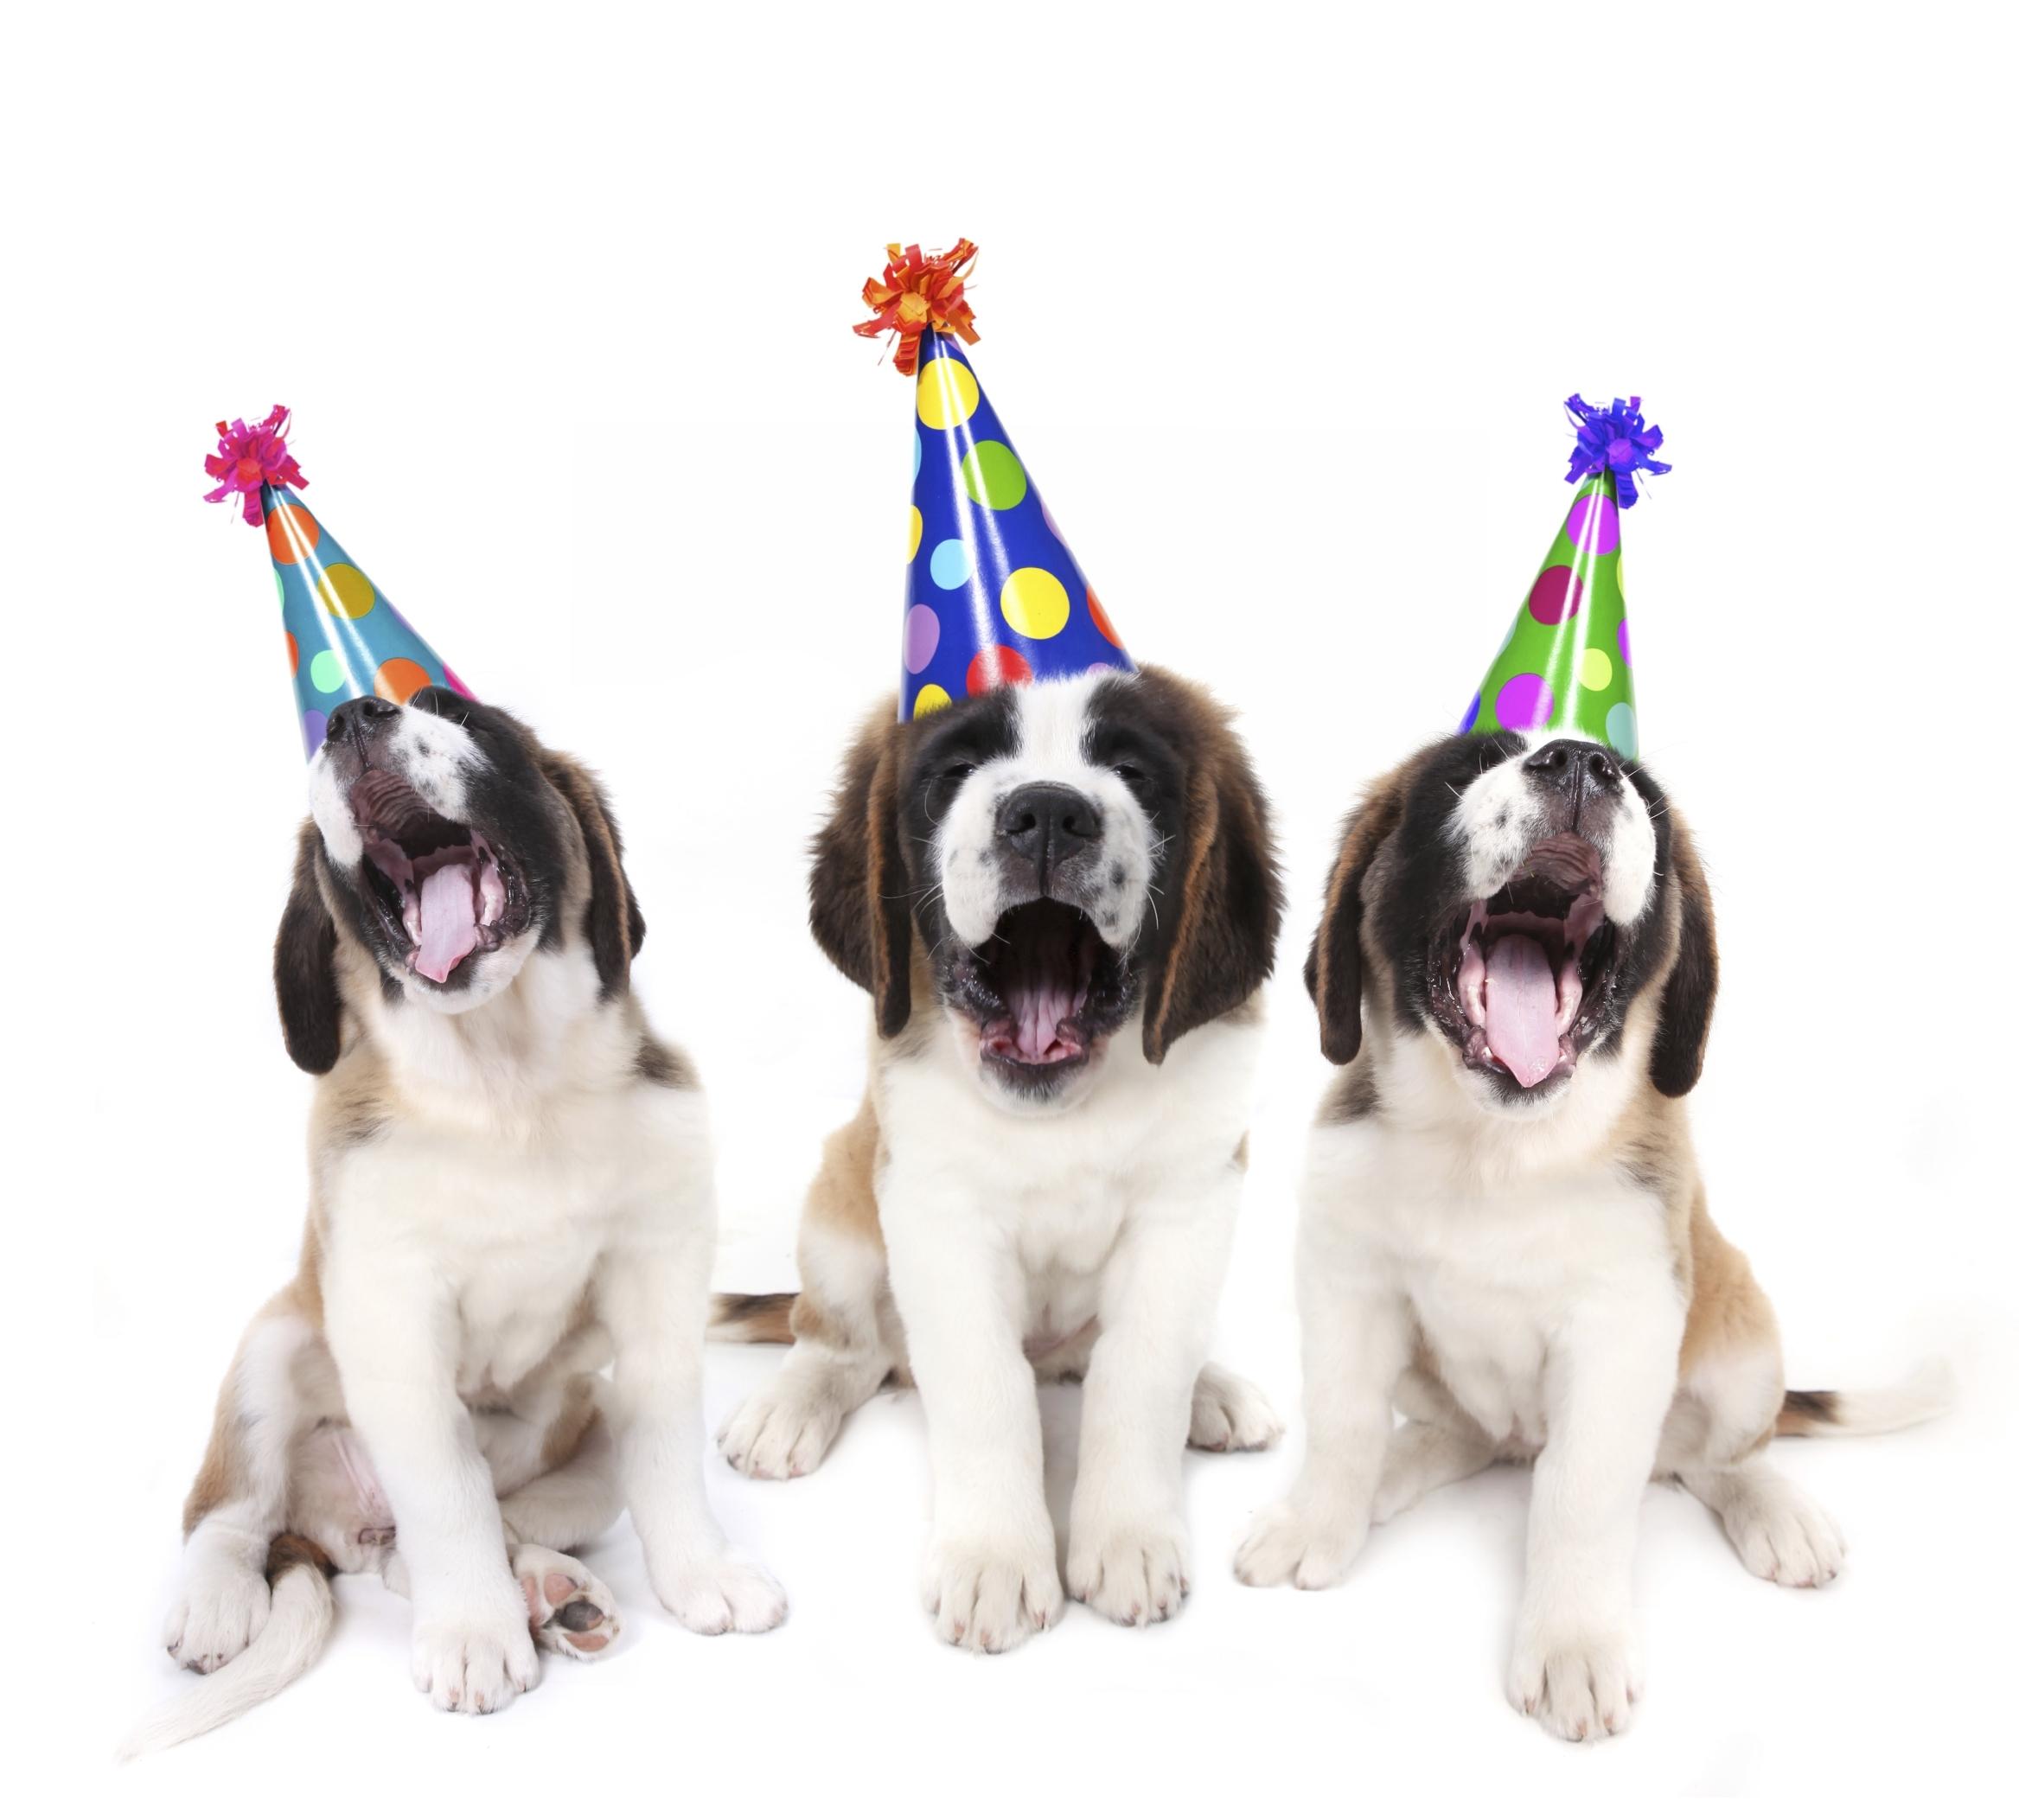 Celebra el cumpleaños de tu mascota